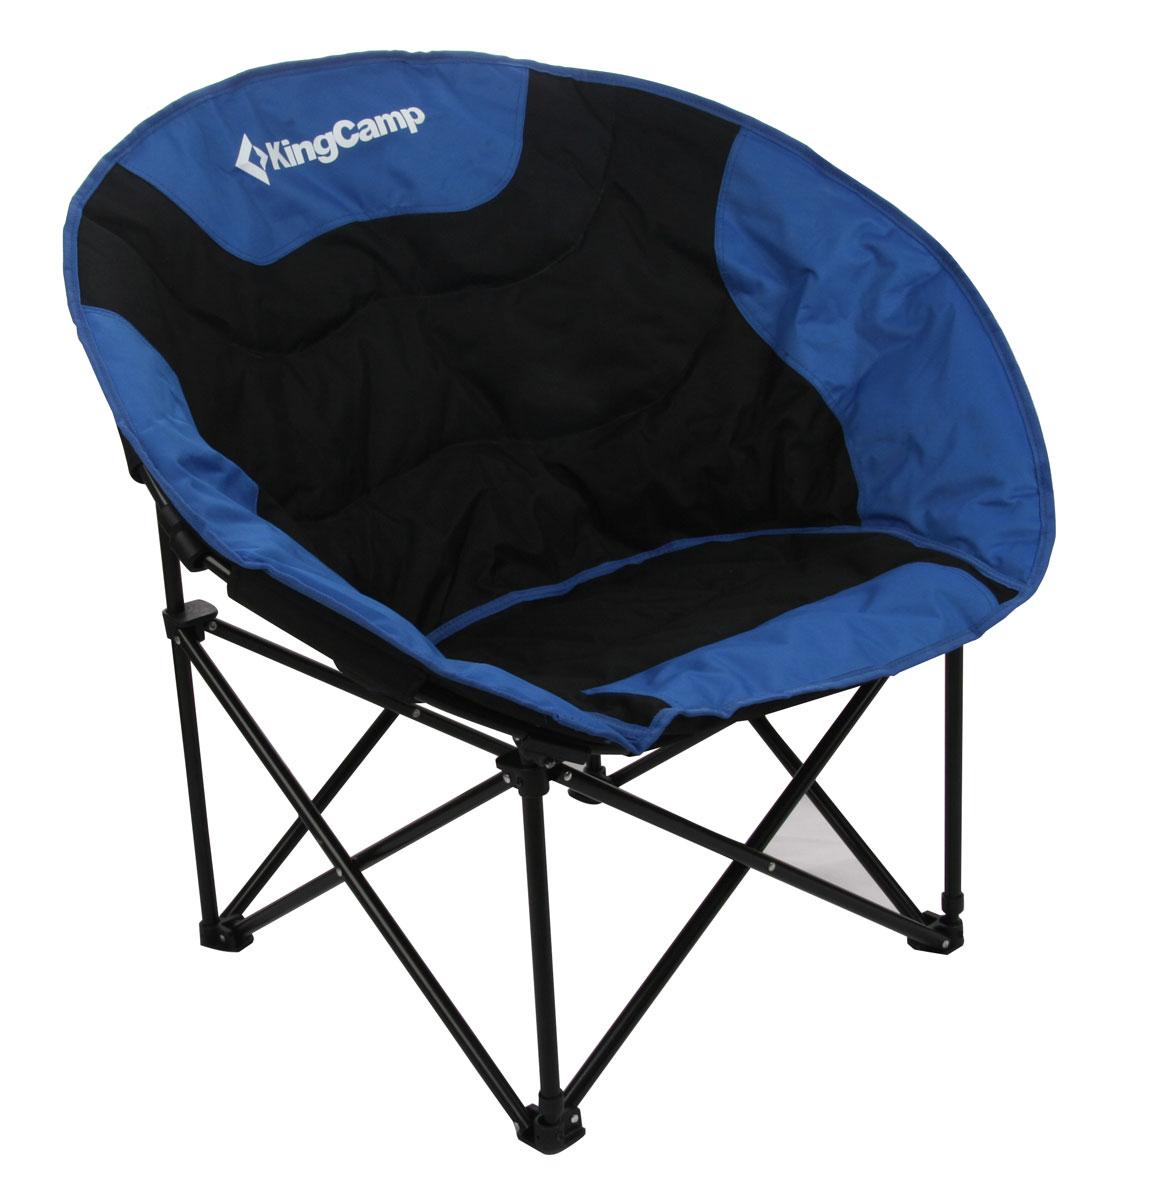 Кресло складное KingCamp Moon Leisure Chair, цвет: синий